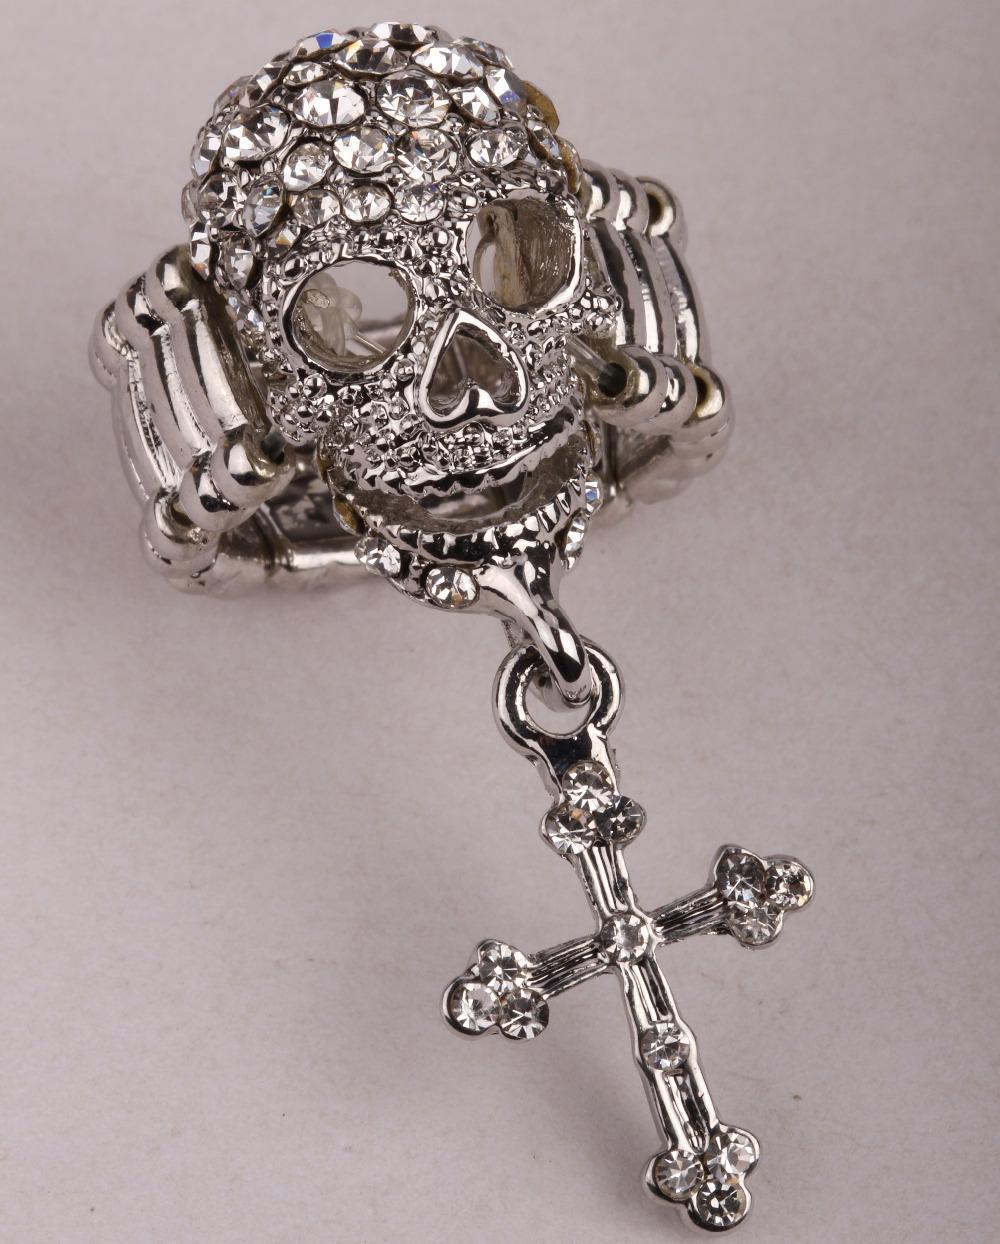 Skull cross stretch ring for women girls halloween costume gothic jewelry biker charm W/ crystal RM36(China (Mainland))